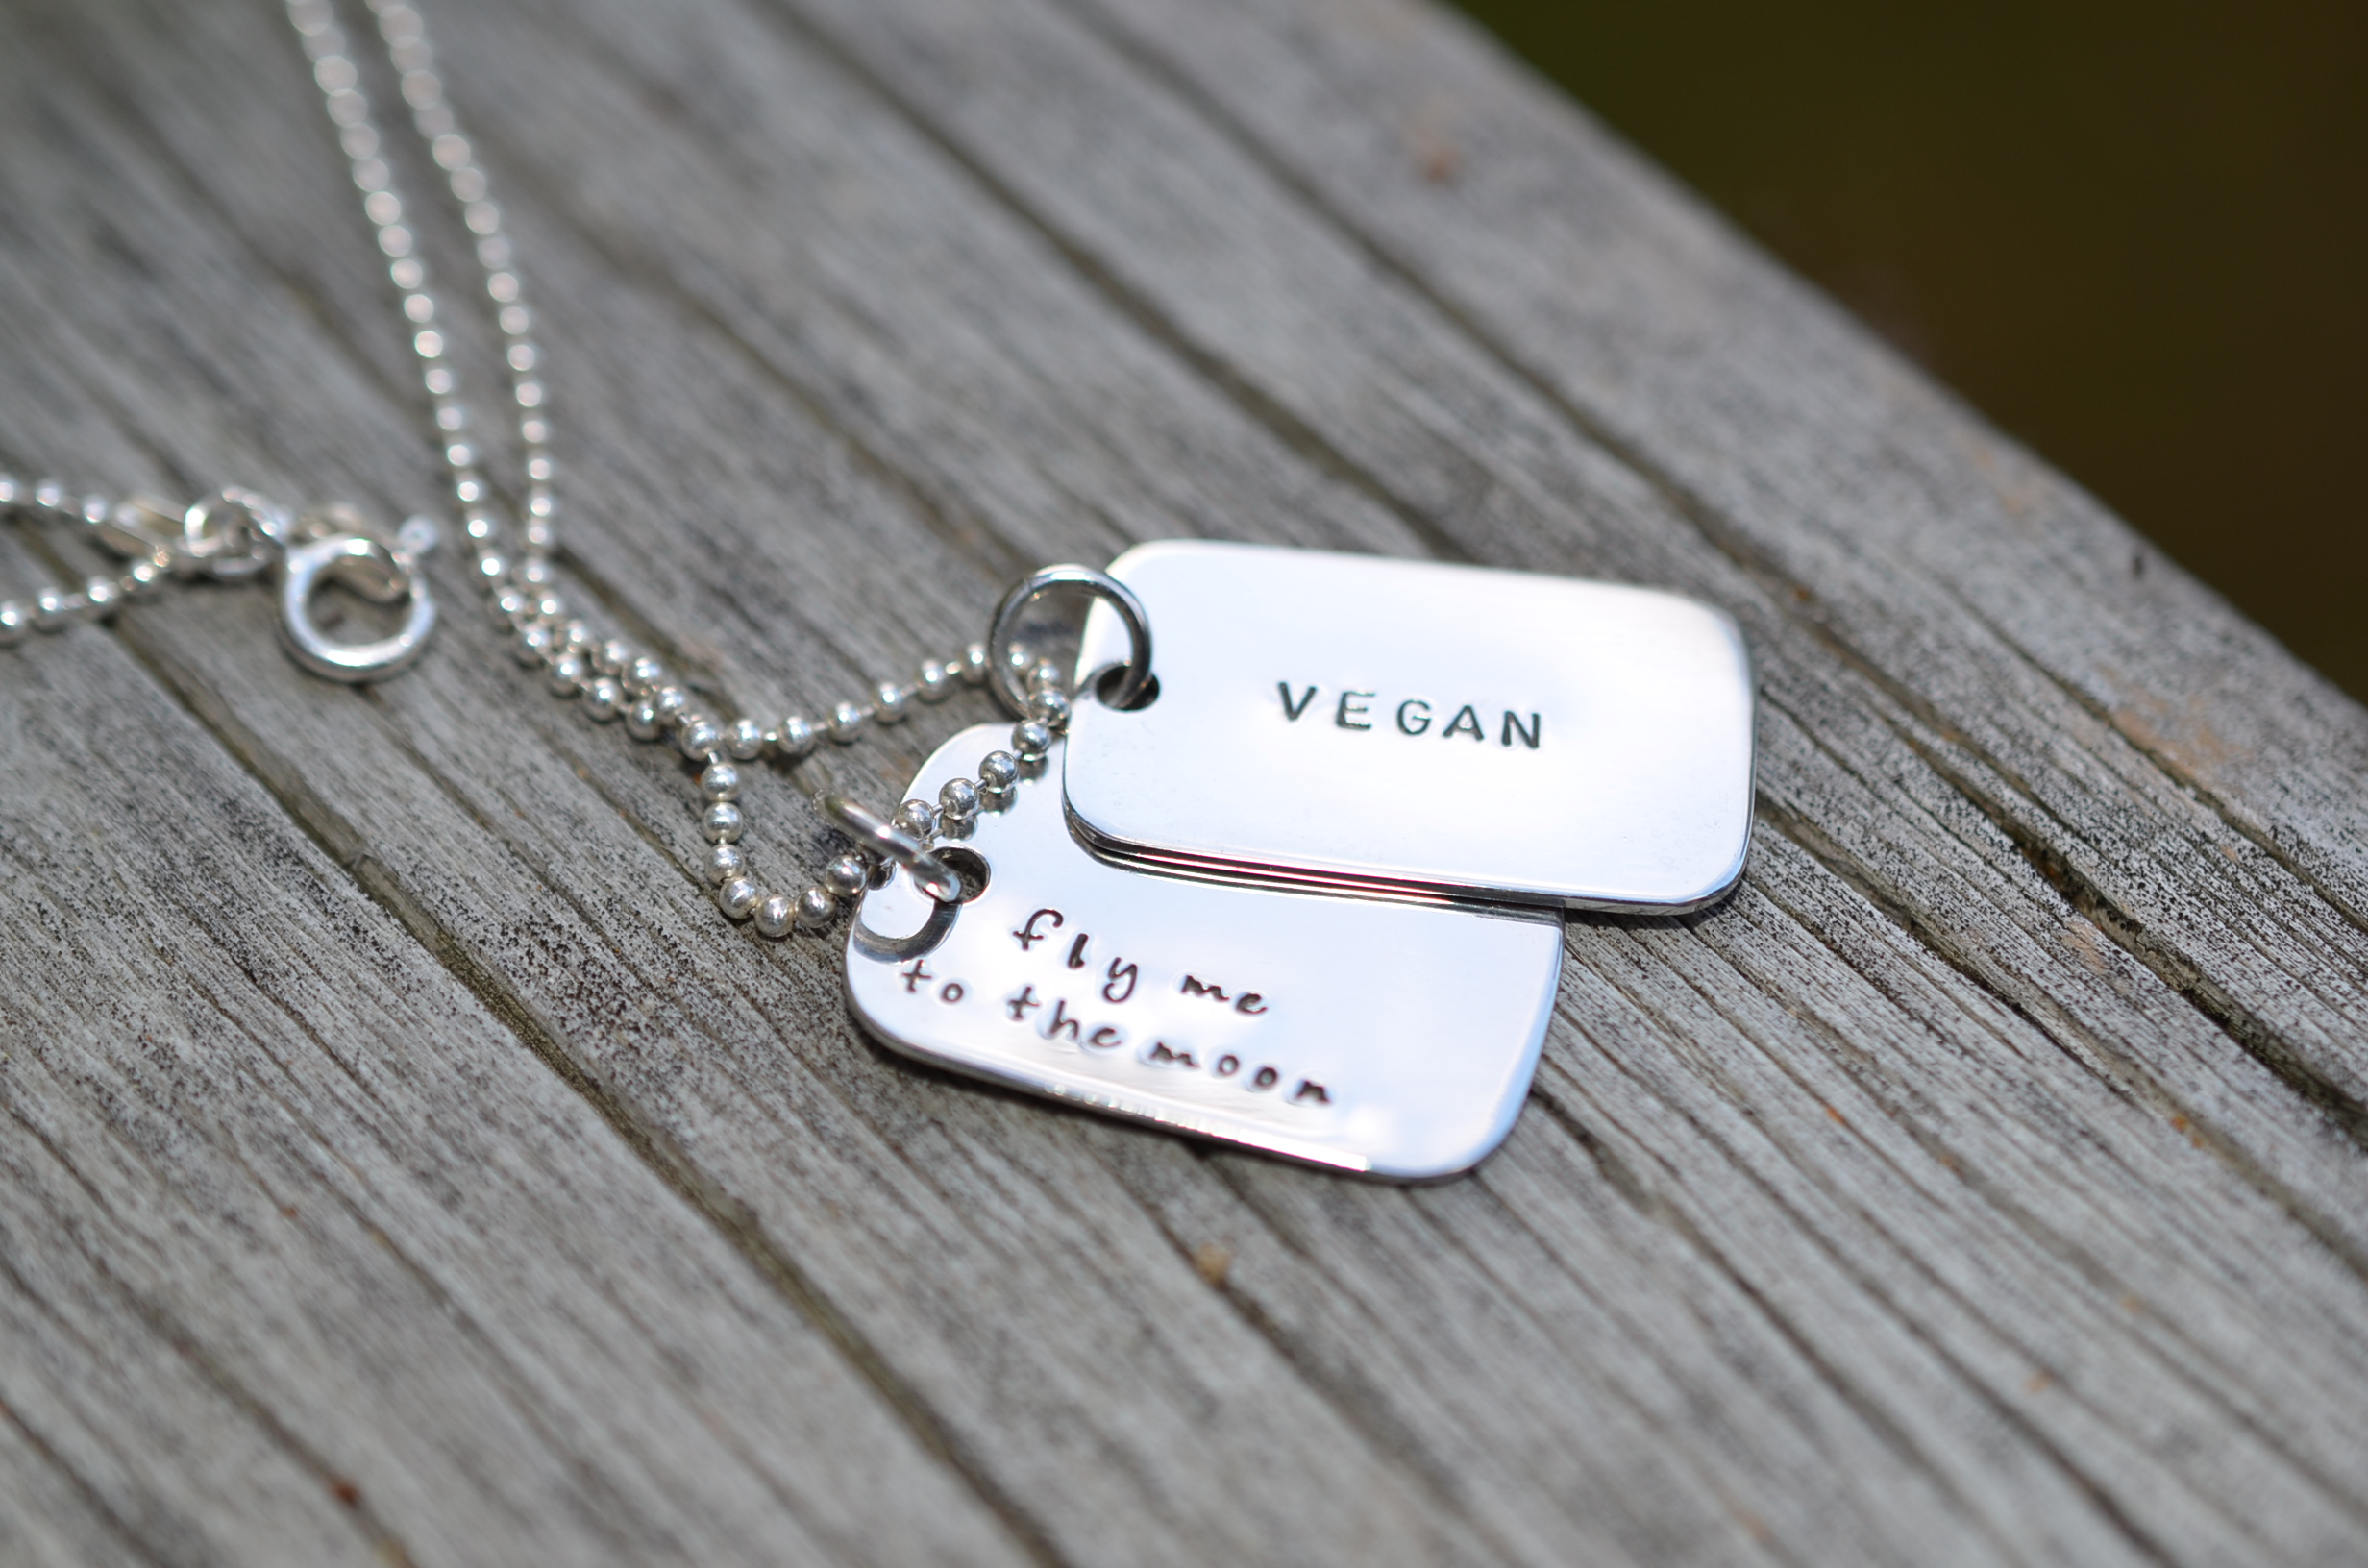 Vegan dog tags